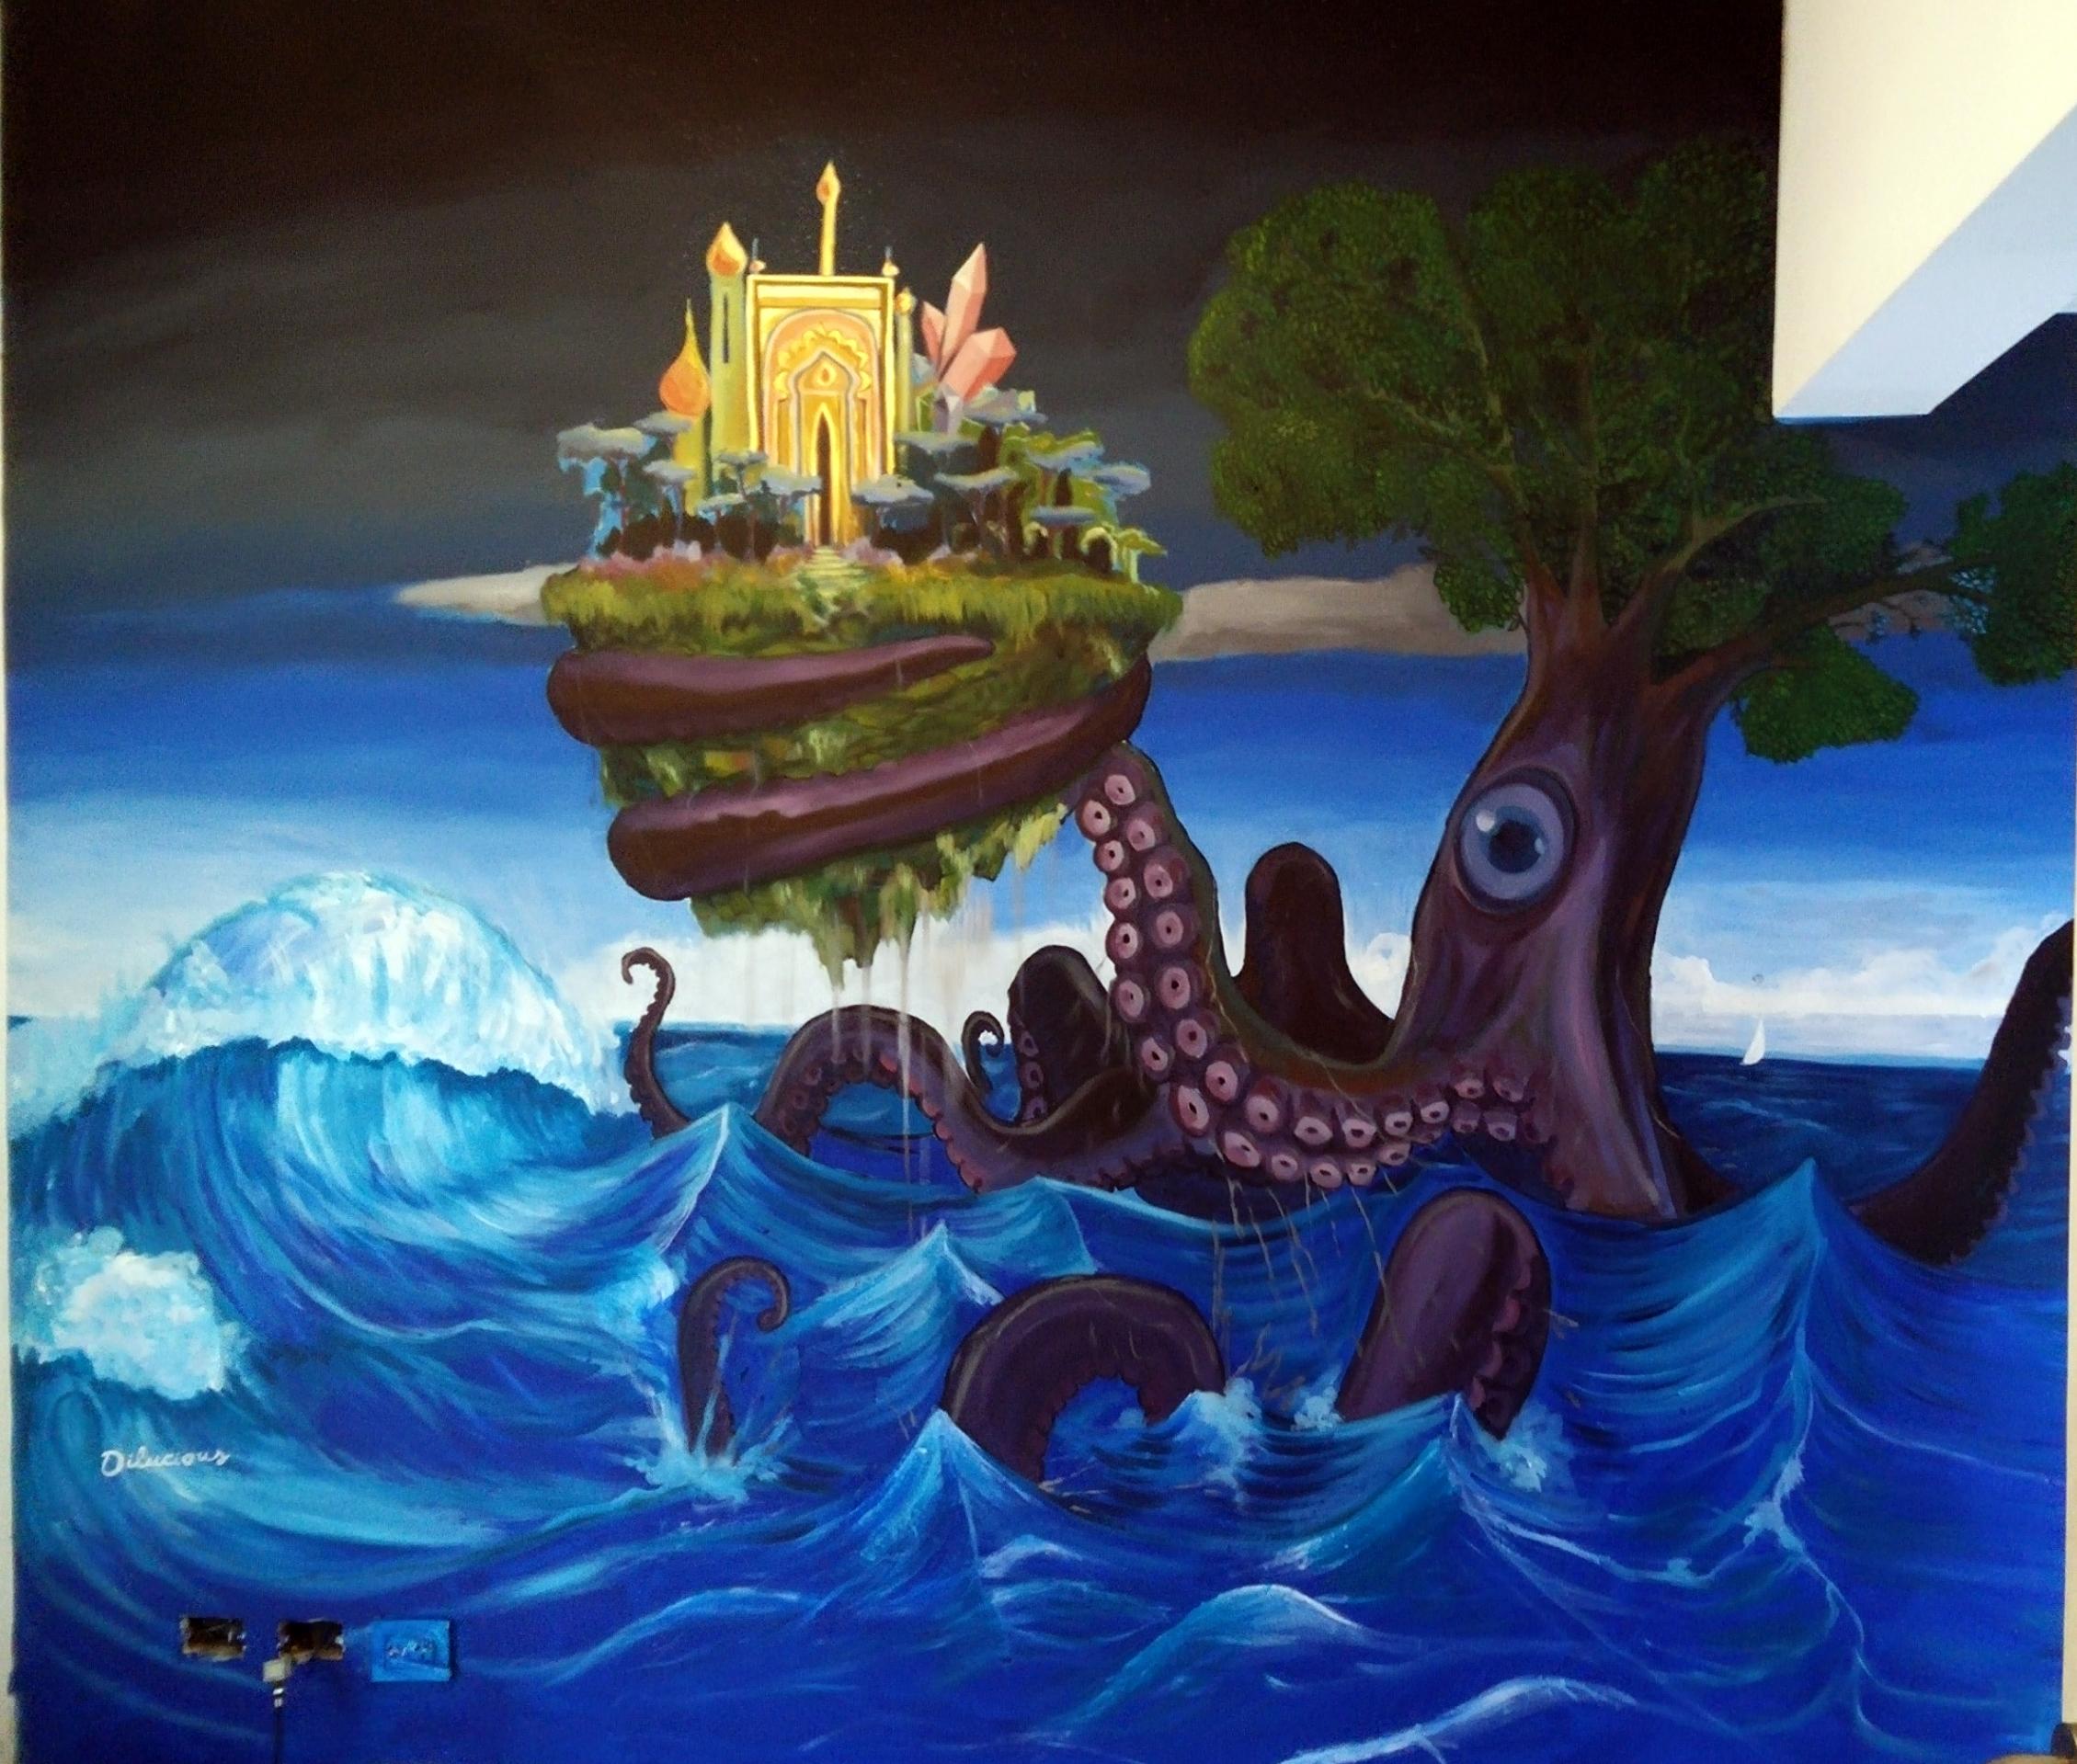 calamar palace by Dilucious 6.jpg